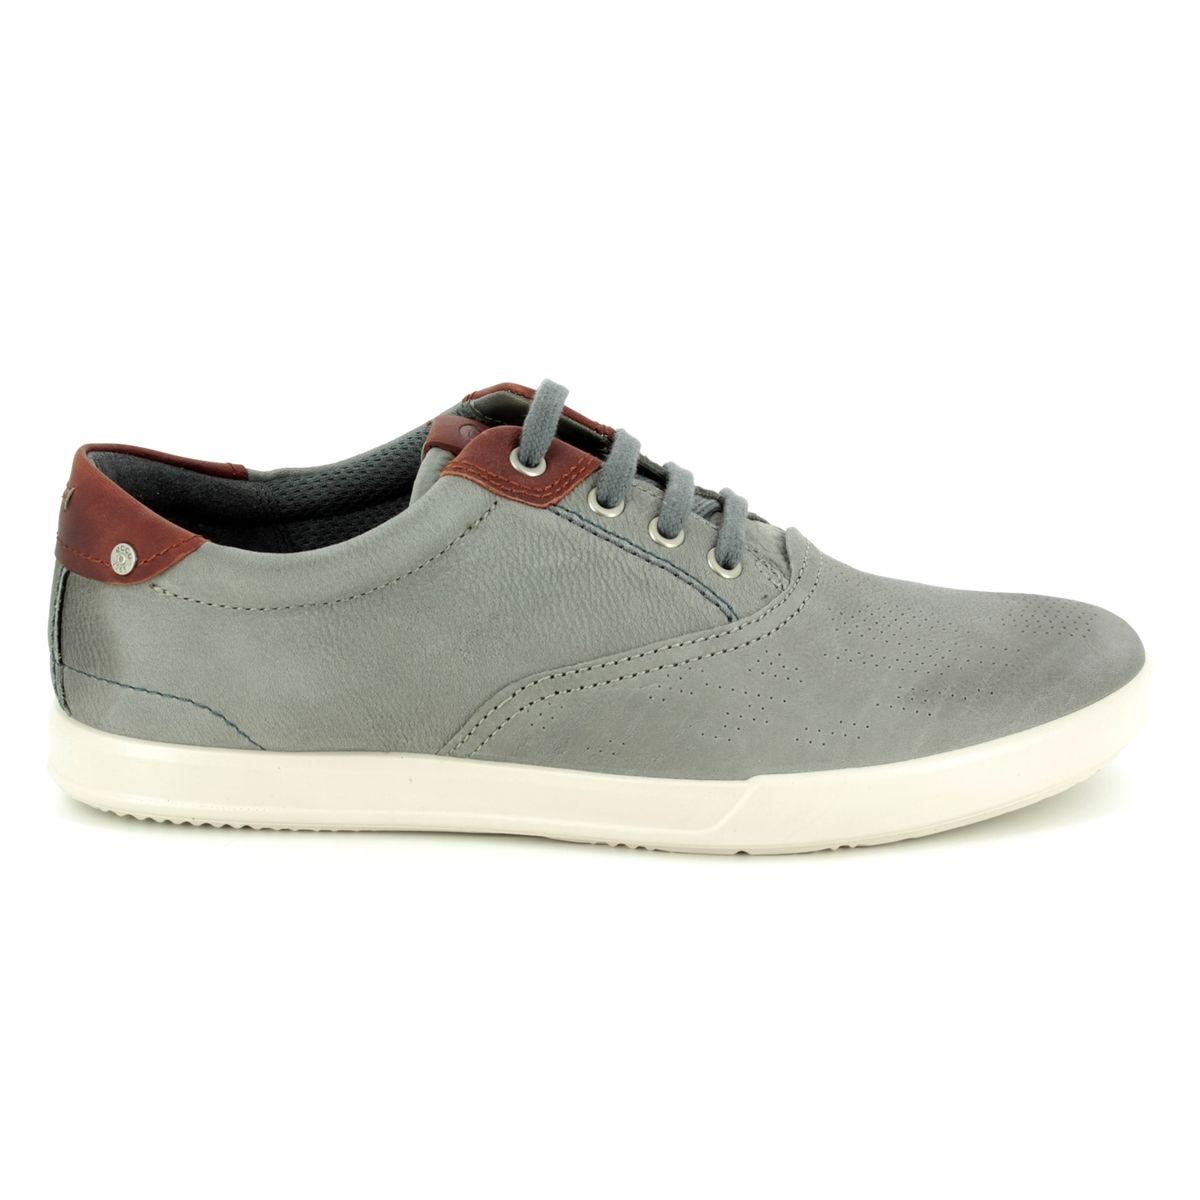 Plain 536224-58267 Grey nubuck casual shoes